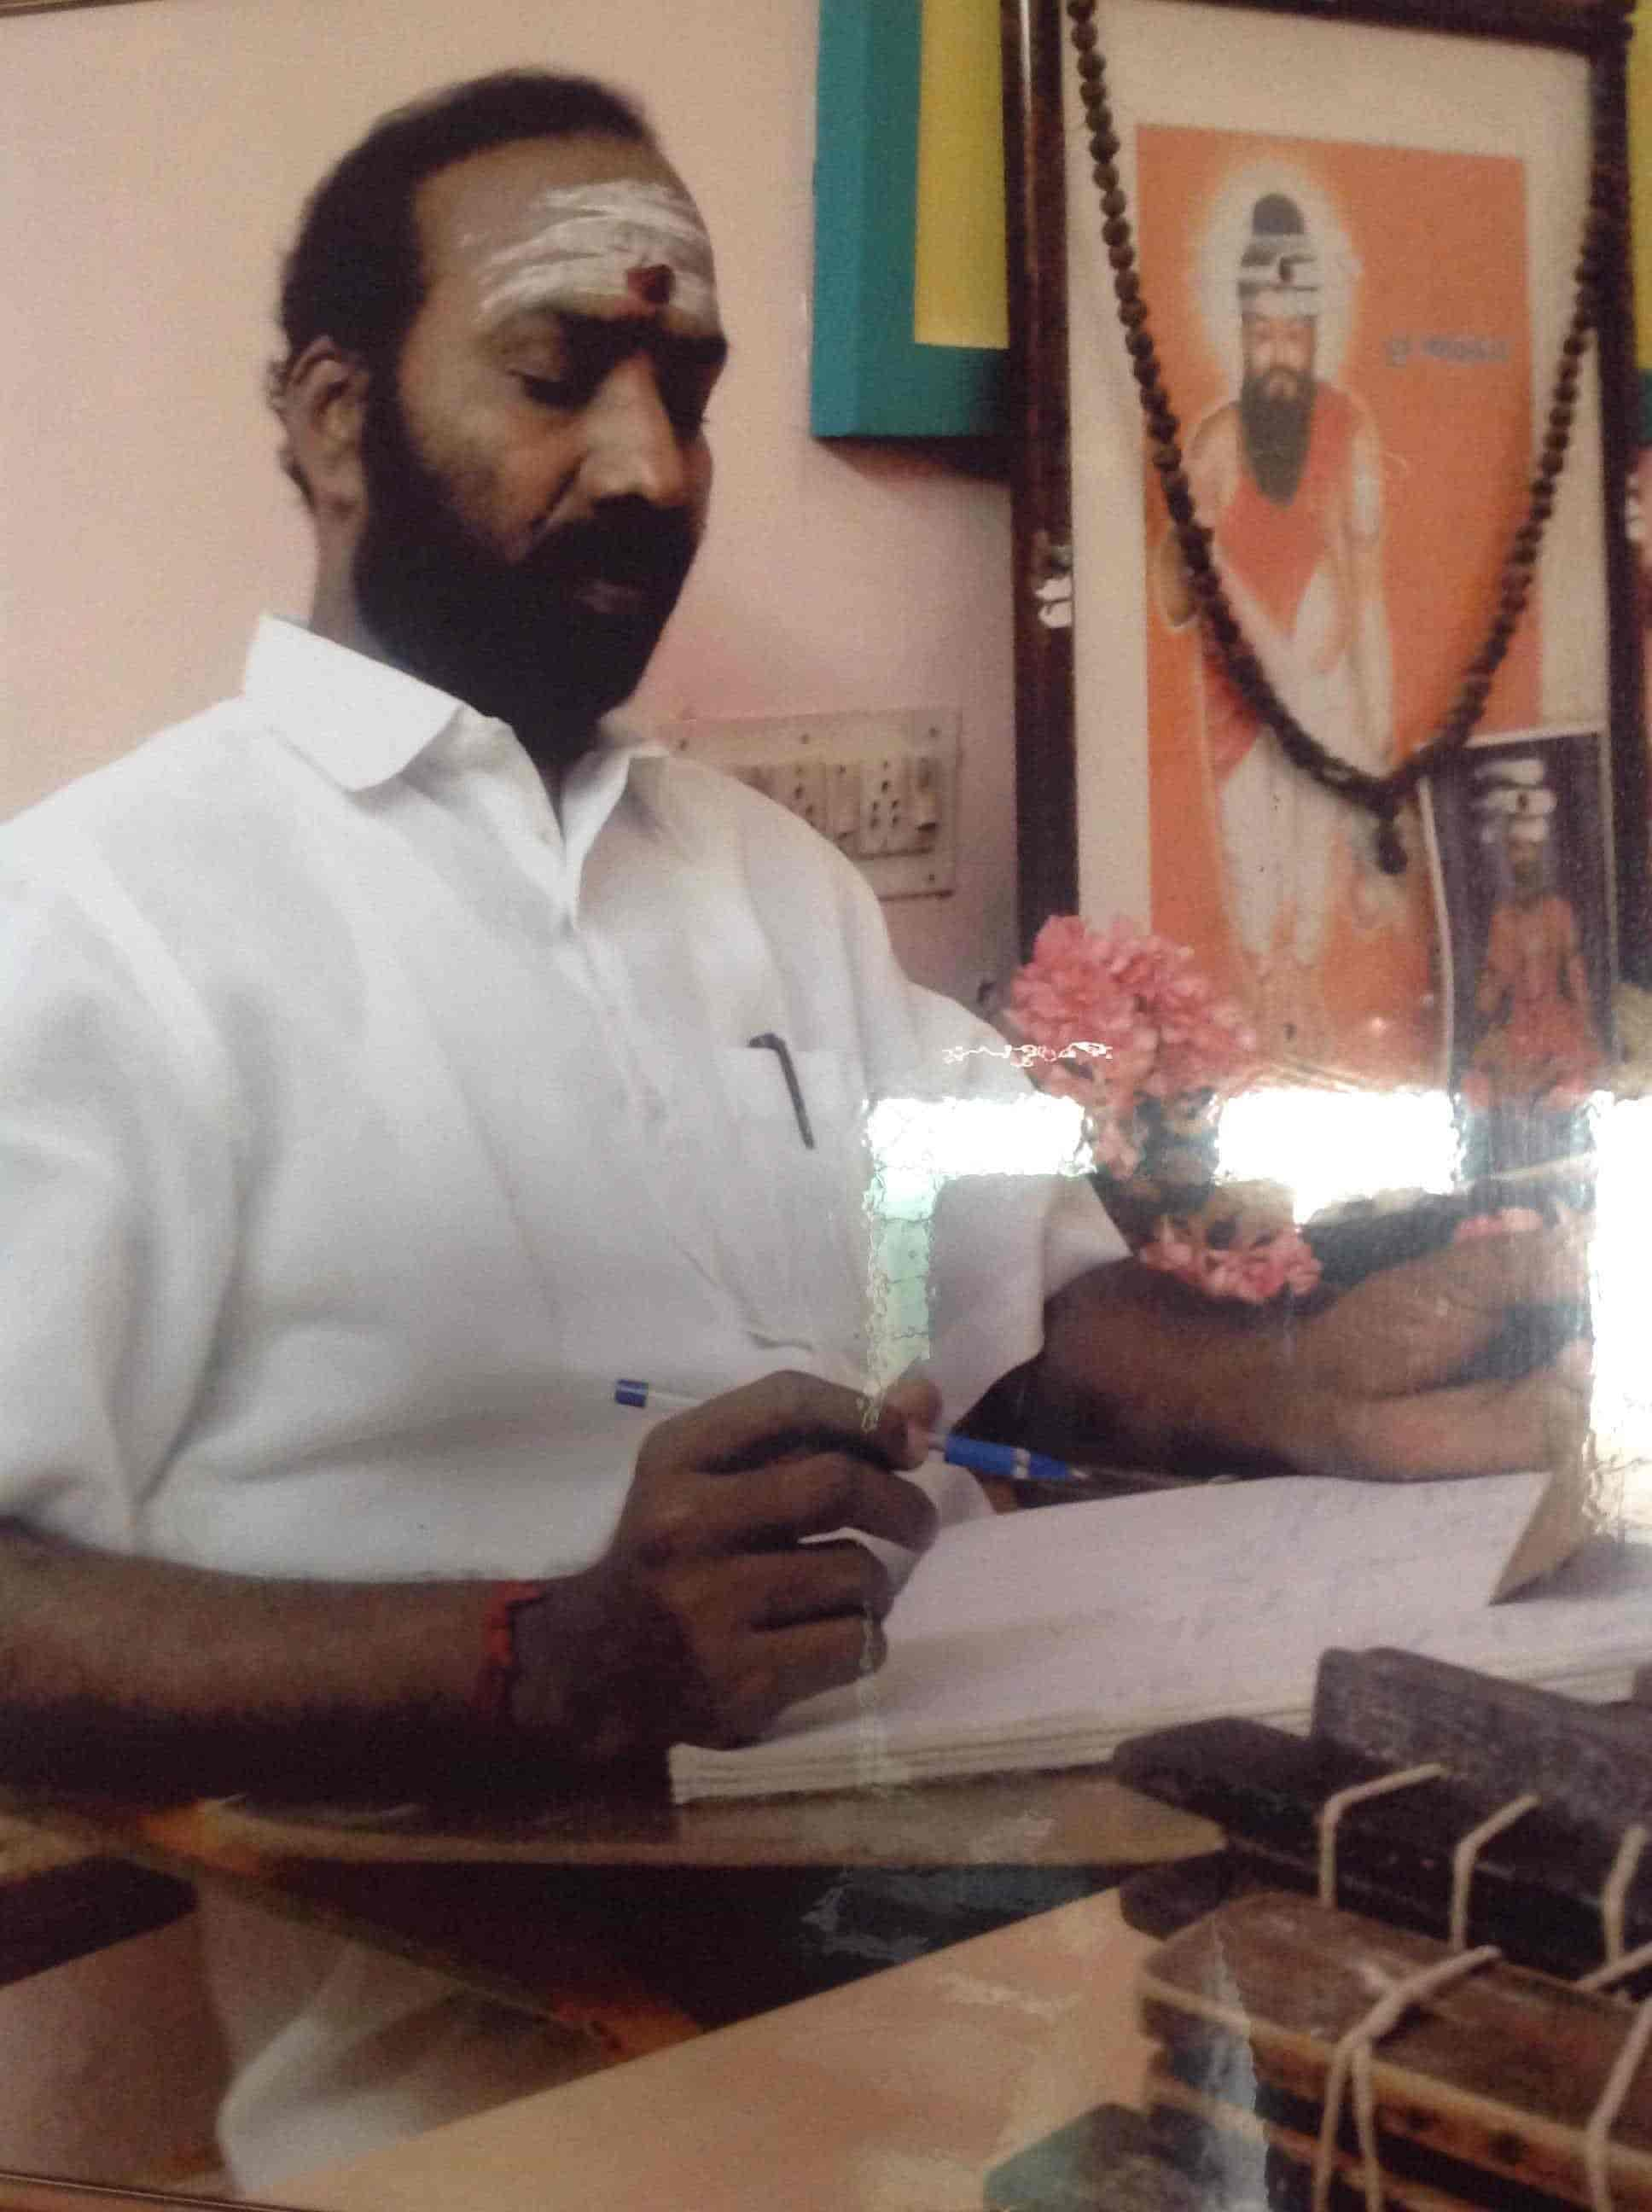 Agathiyar jothidam online dating